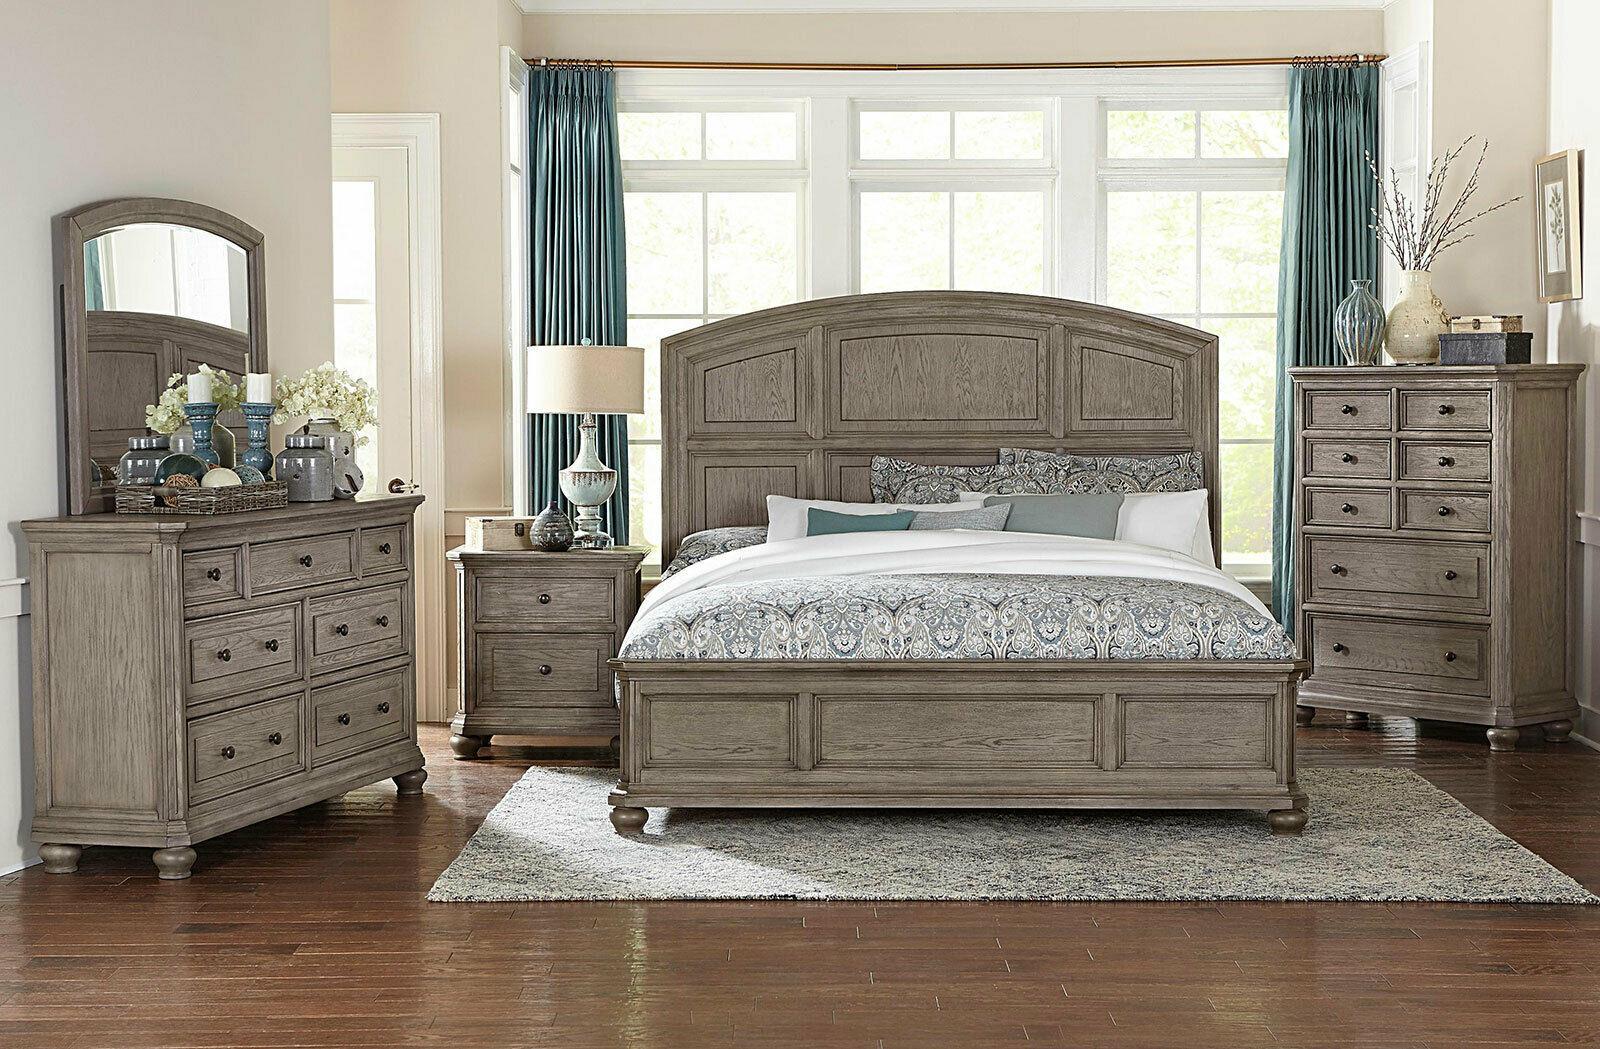 holden 5 pieces traditional rustic gray oak bedroom set w